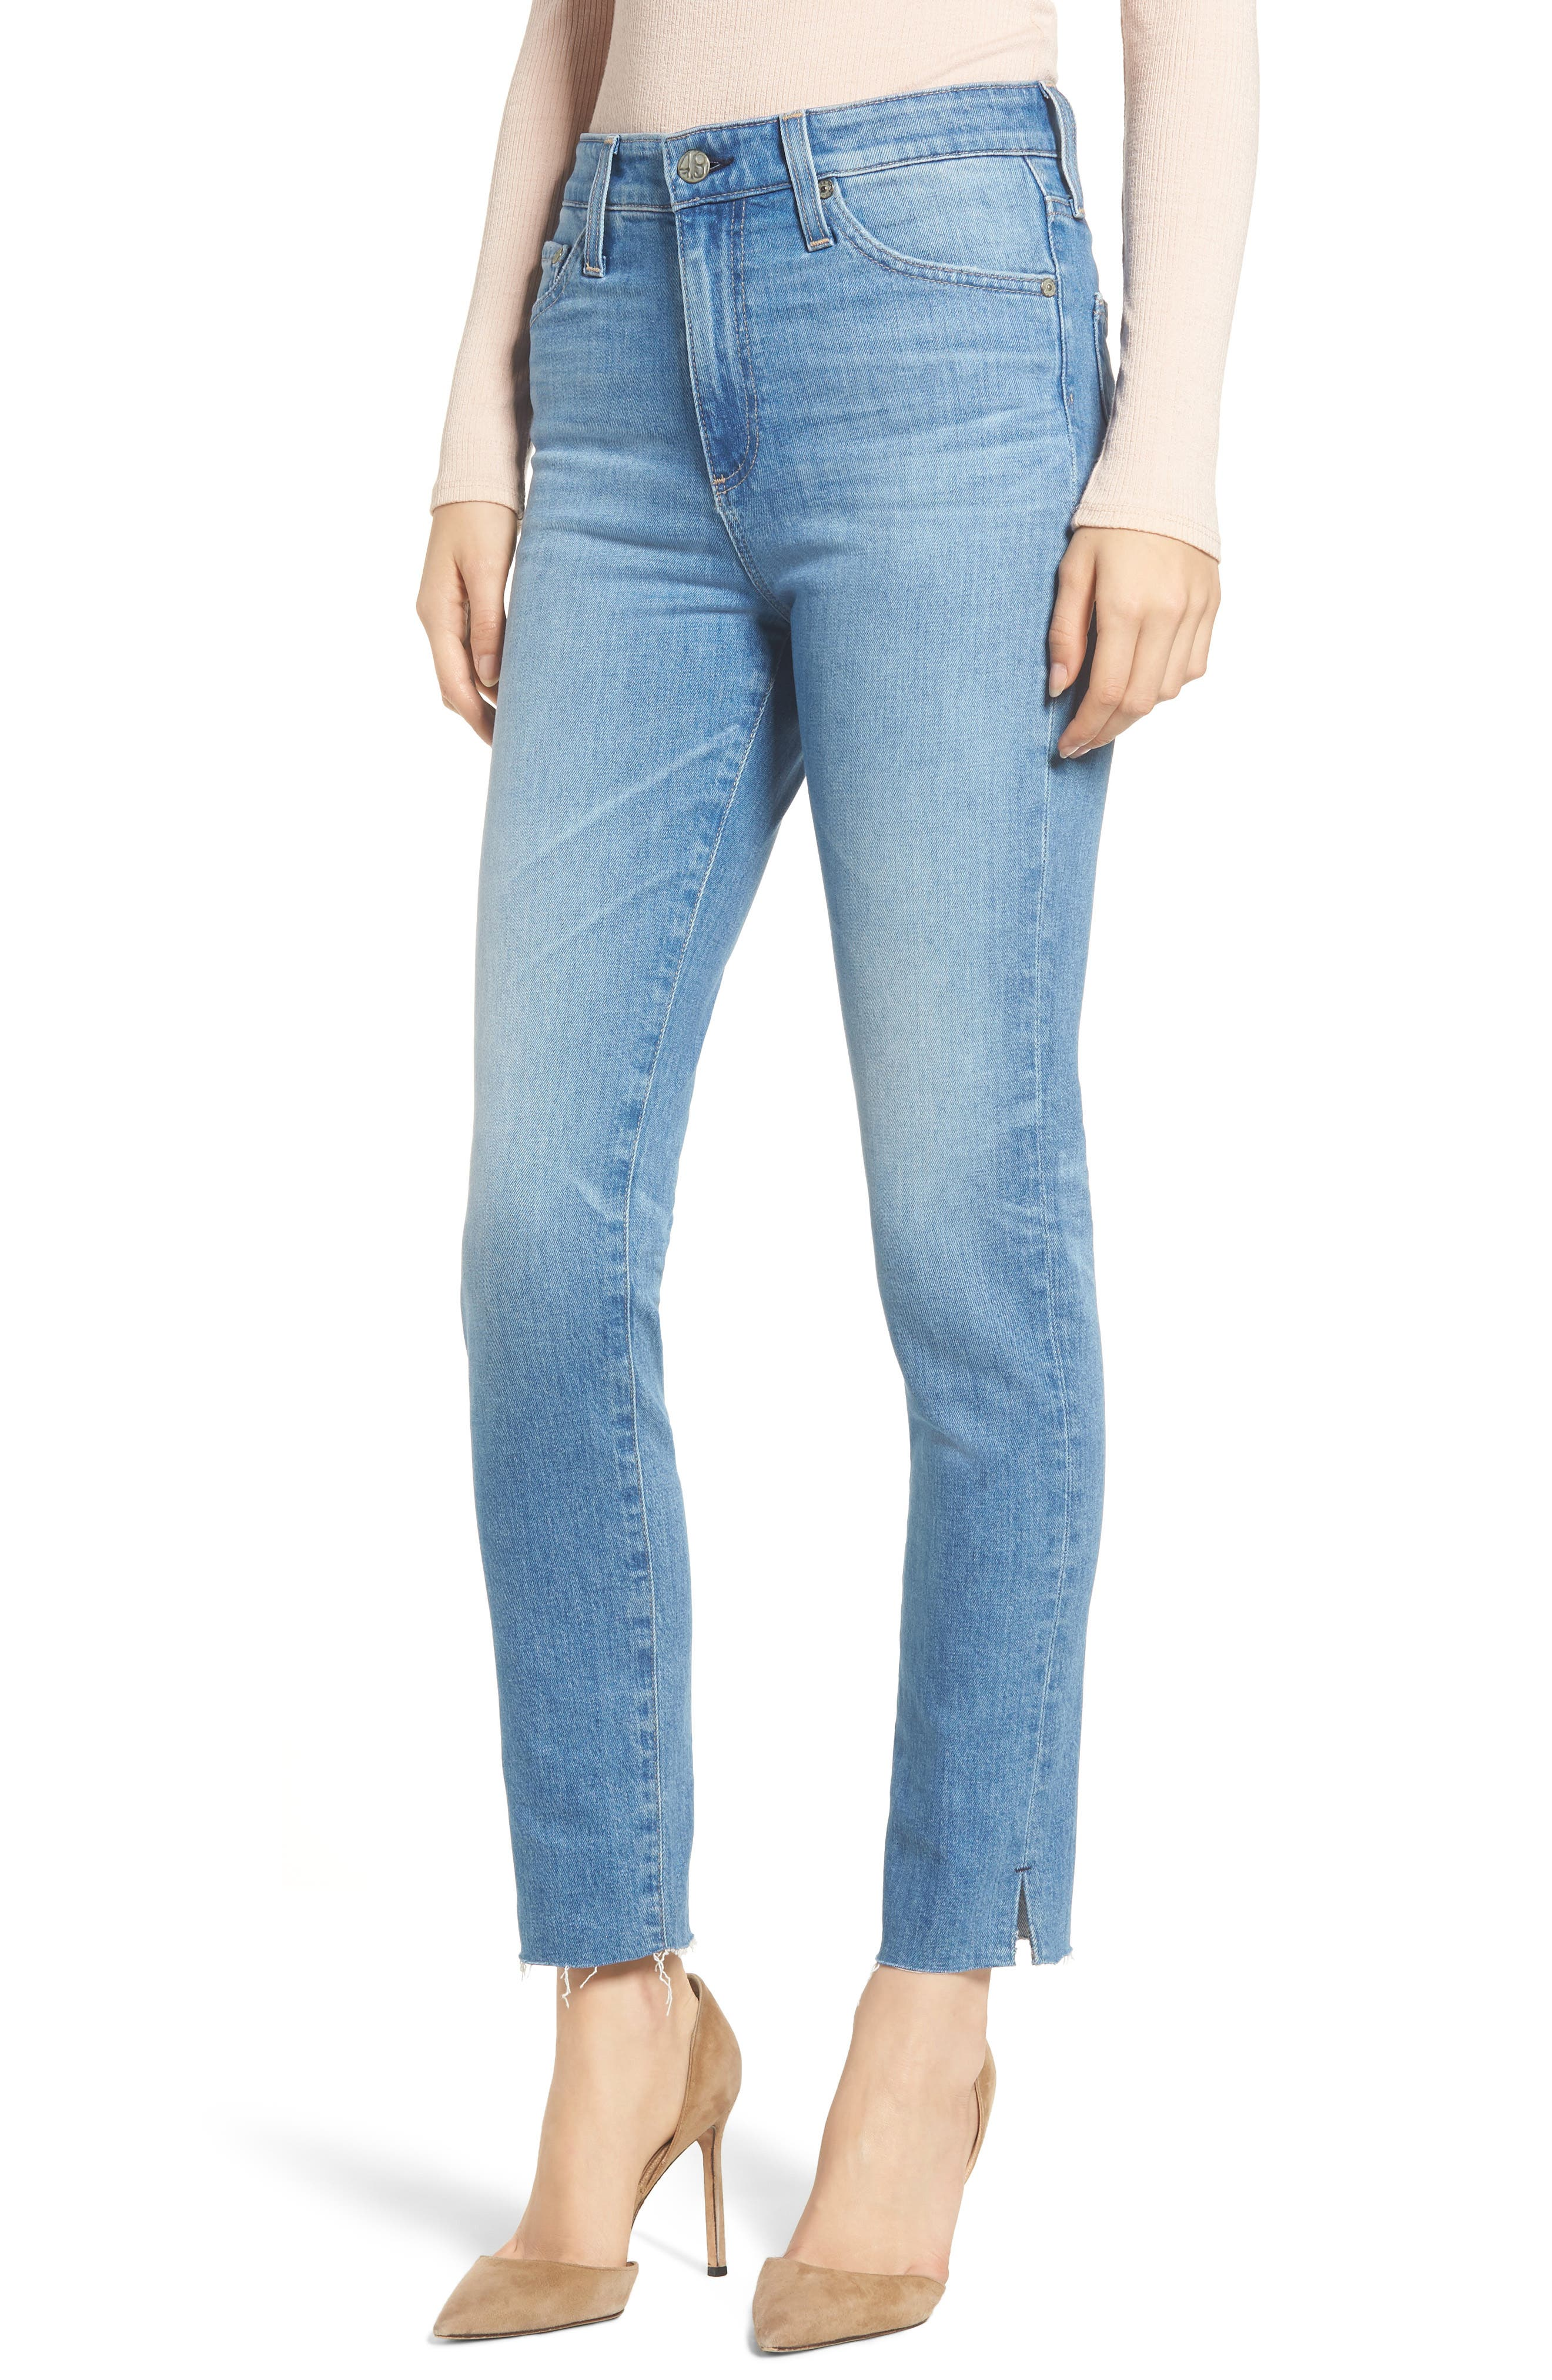 AG, Sophia Raw Hem High Waist Ankle Skinny Jeans, Main thumbnail 1, color, 467